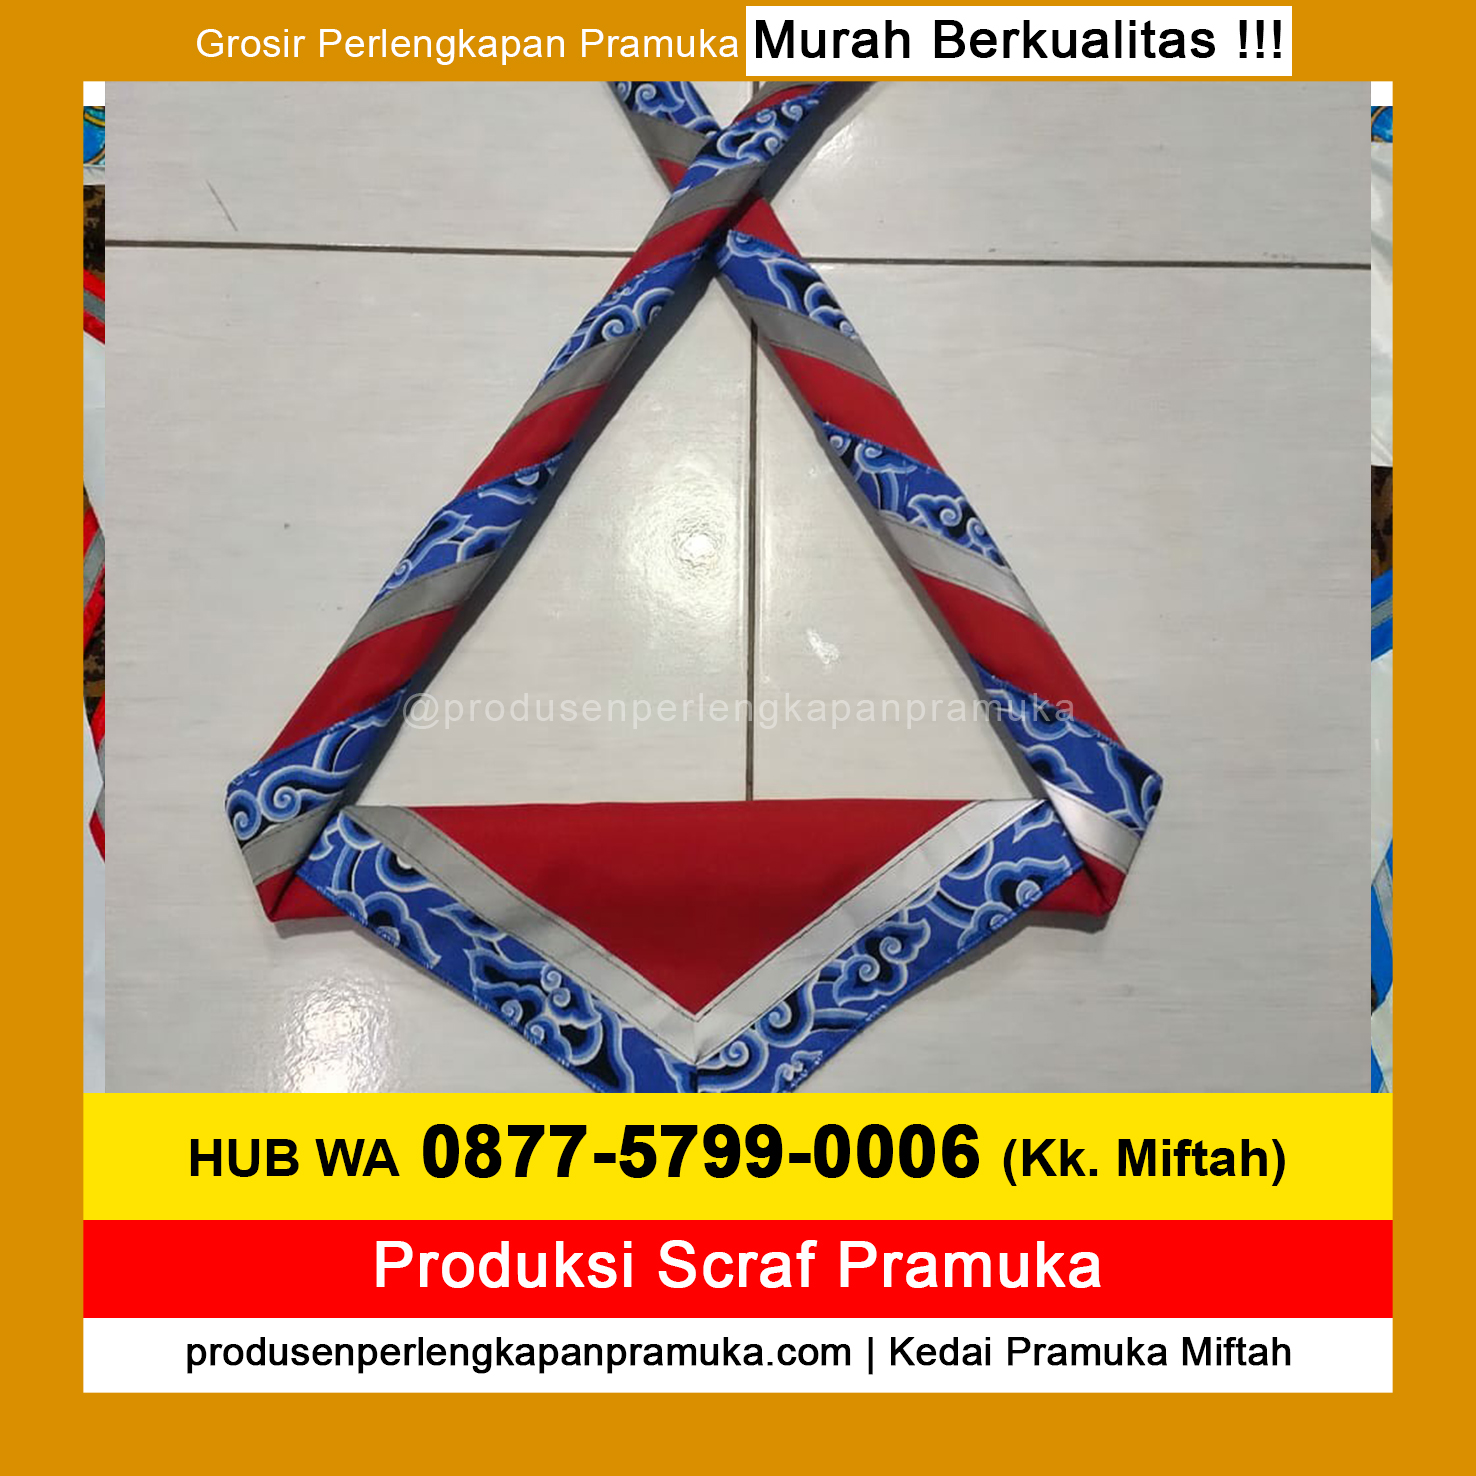 WA 0877-5799-0006 Produsen Jual Produksi Grosir Scraft Pramuka Glow In The Dark, Scarf Pramuka Murah